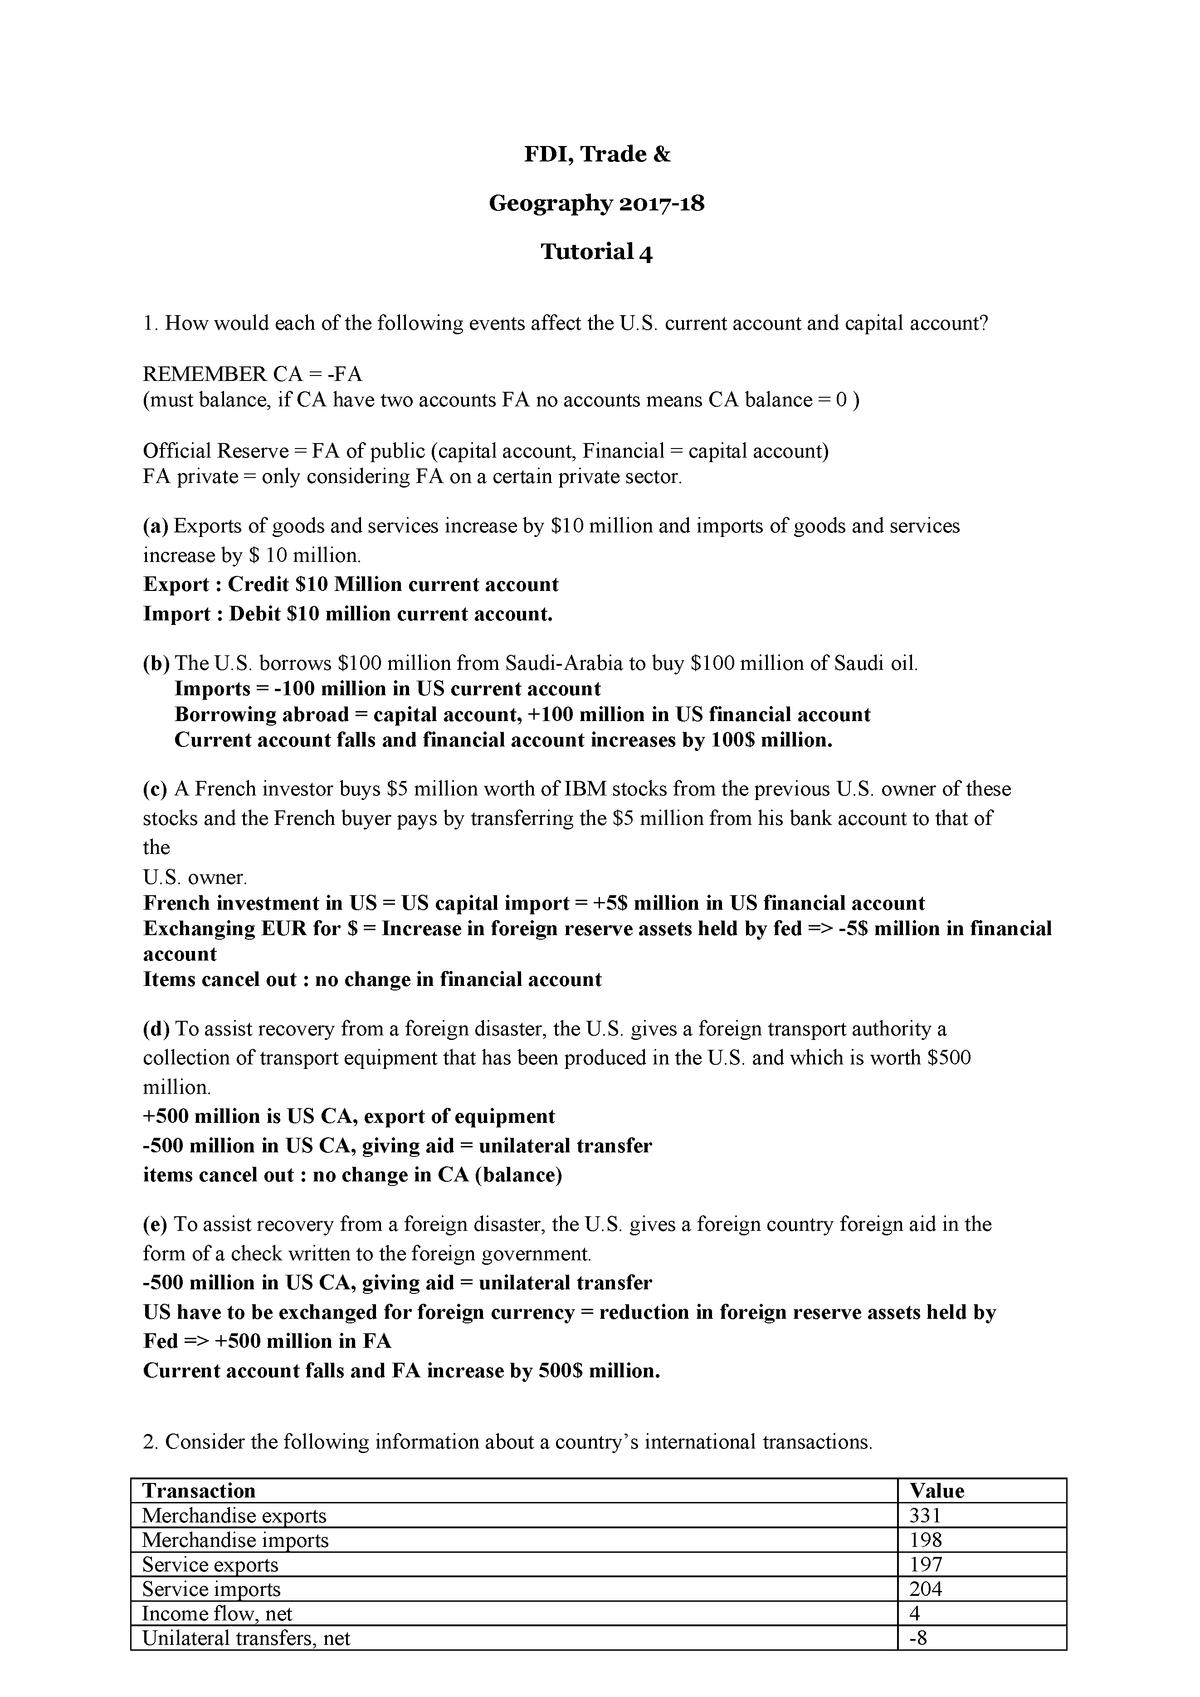 FDI Tutorial 4 Questions + Answers - EBB037A05 - RUG - StuDocu